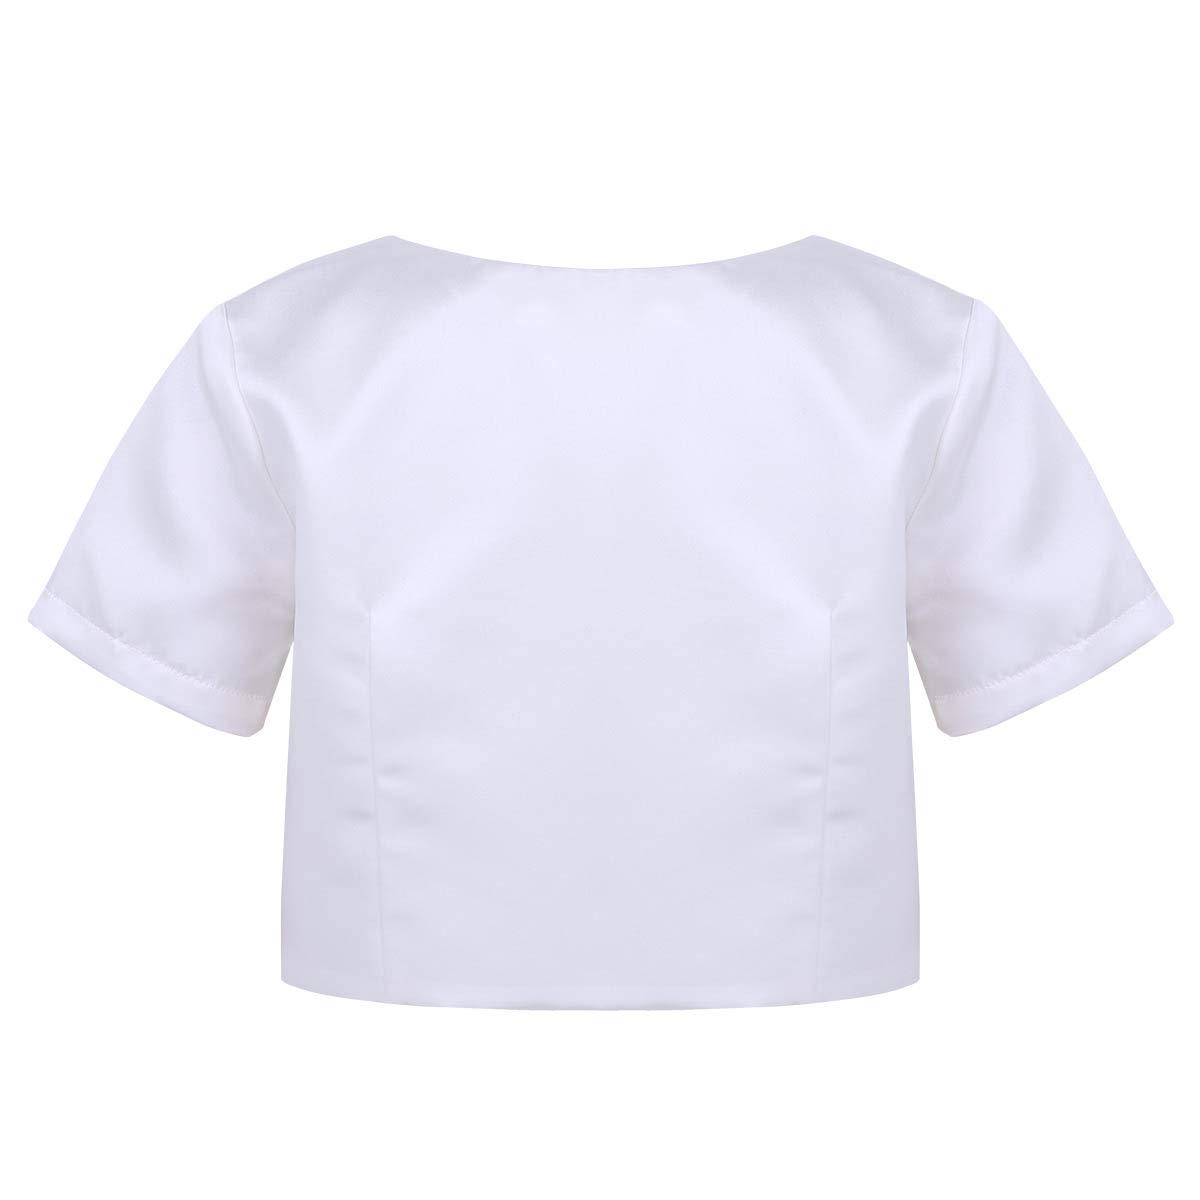 Freebily Kids Girls Satin Short Sleeve Round Neck Faux Pearl Buttons Closure Bolero Short Jacket Shrug Party Dress Cover Up